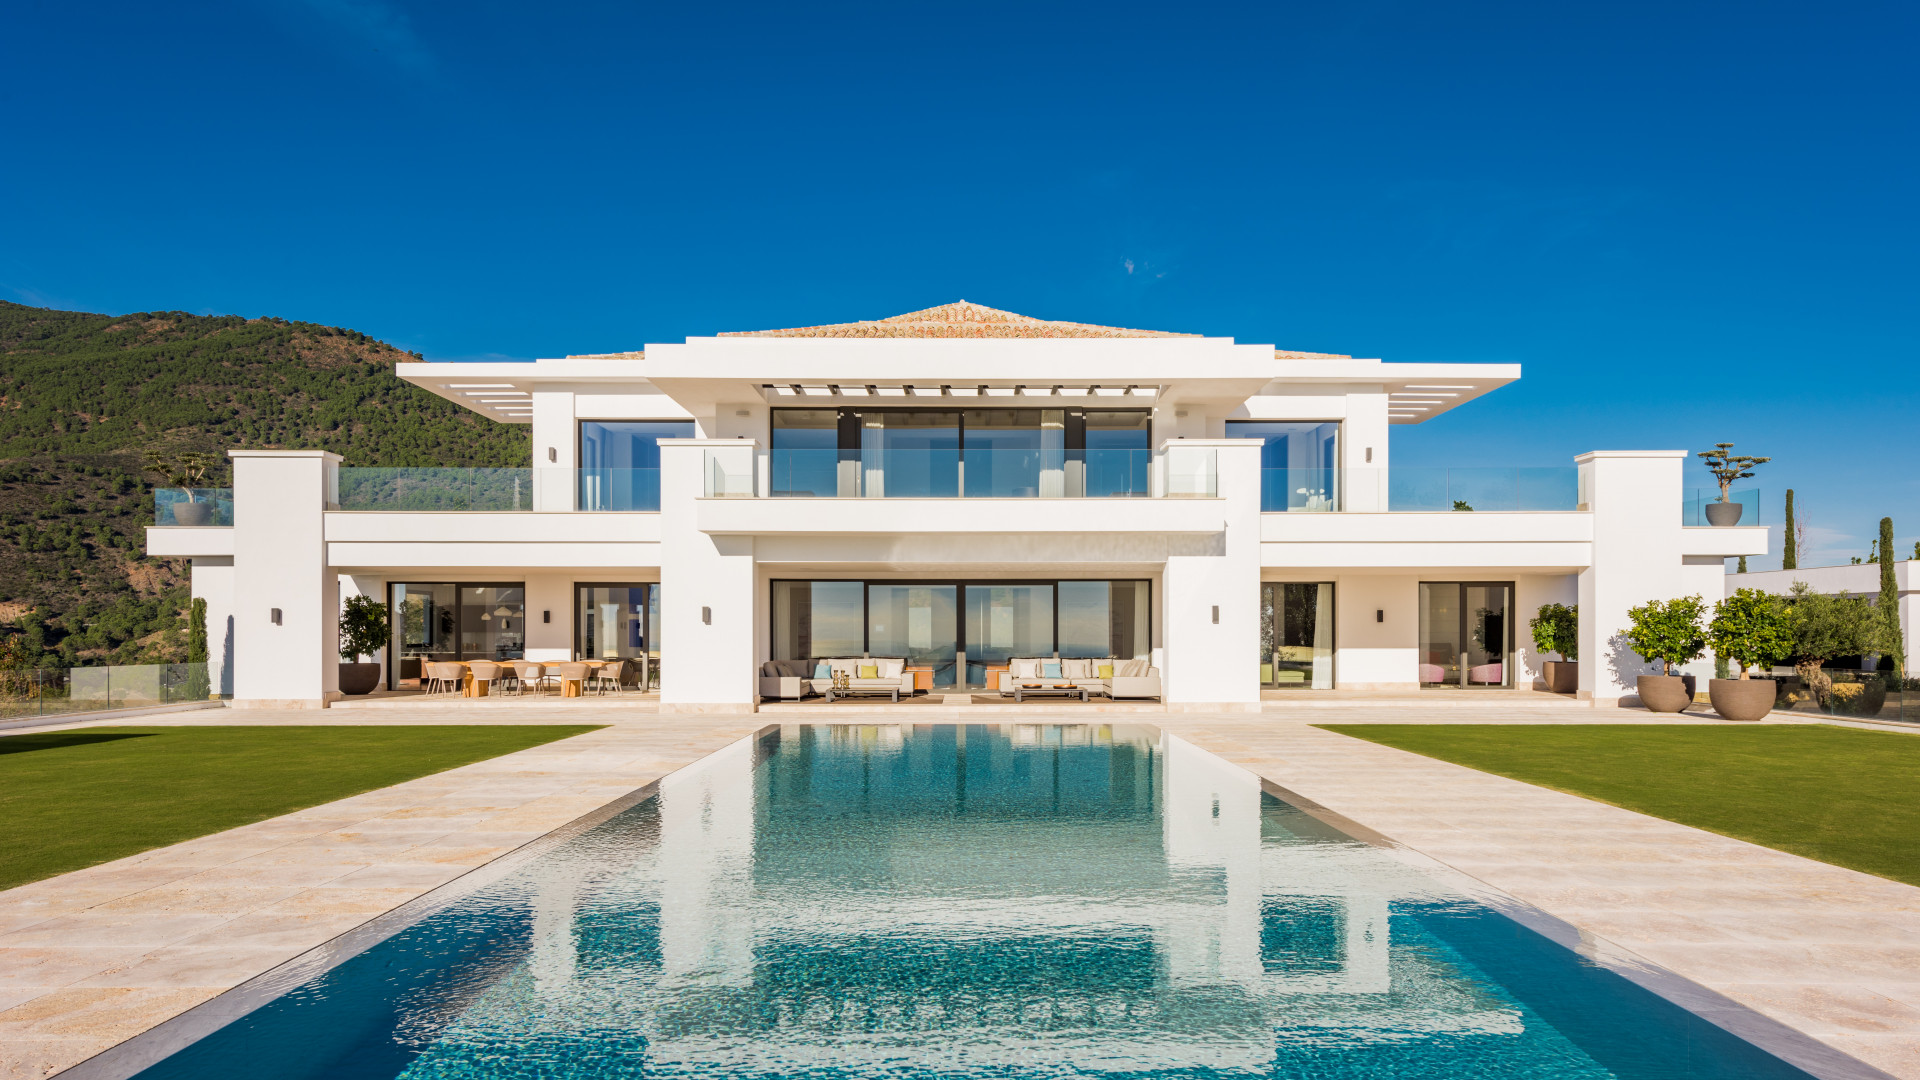 ARFV2098 - Villa der Superlative zu verkaufen in La Zagaleta in Benahavis